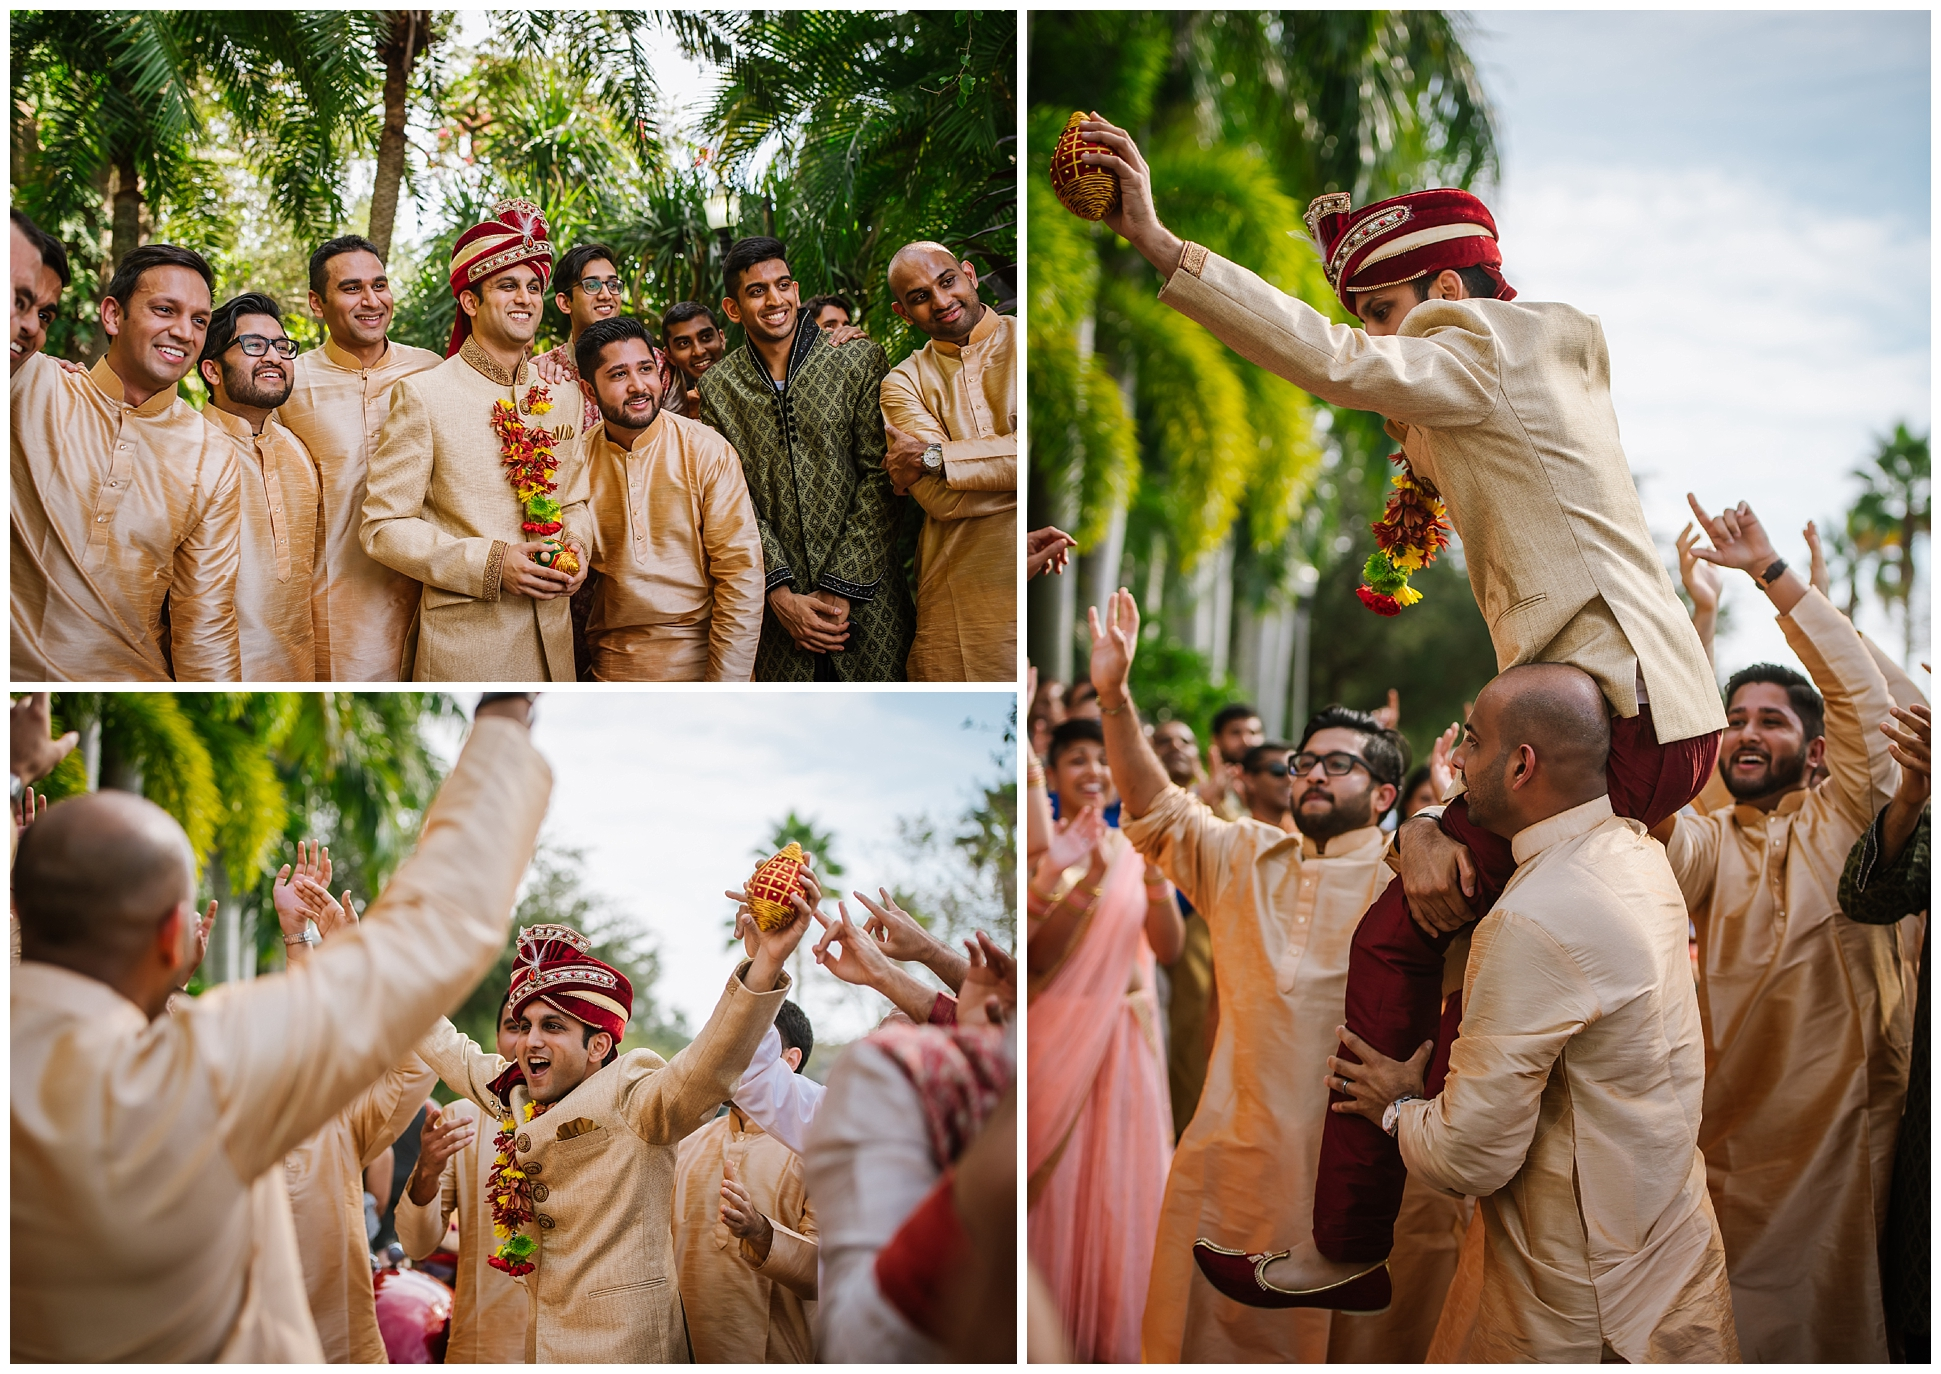 St-pete-indian-wedding-photographer-barat-sunken-gardens_0090.jpg